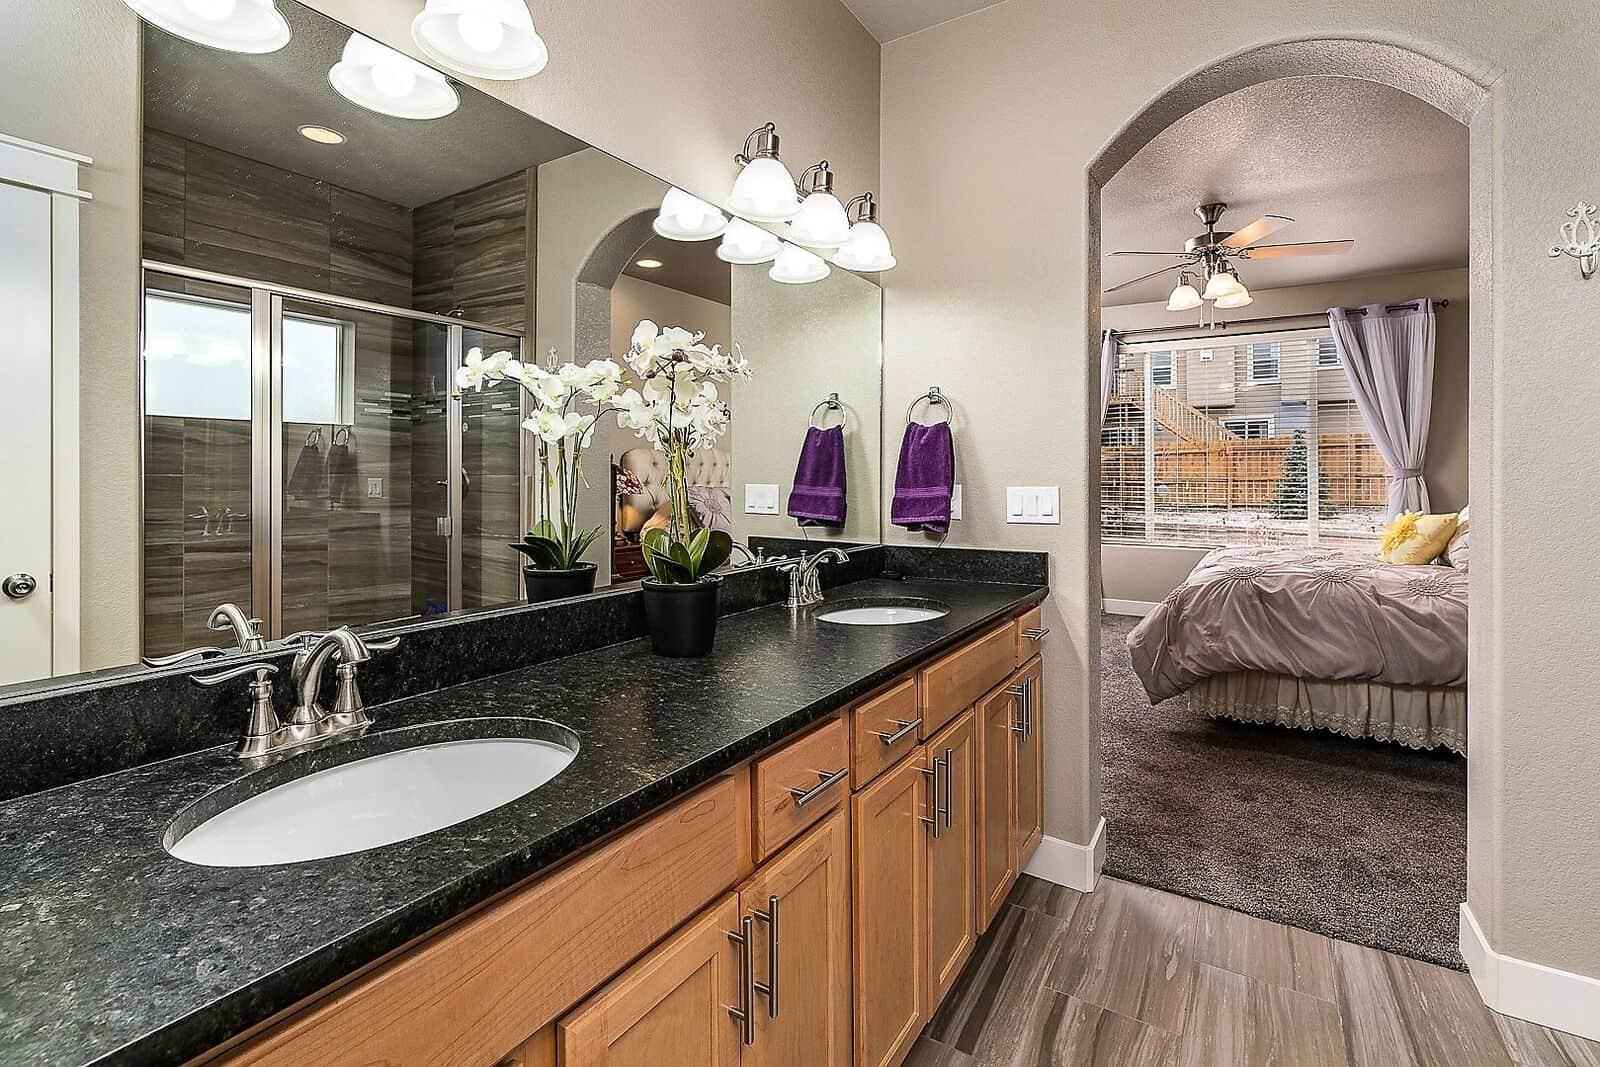 Leather Finish Granite Counters in Master Bathroom